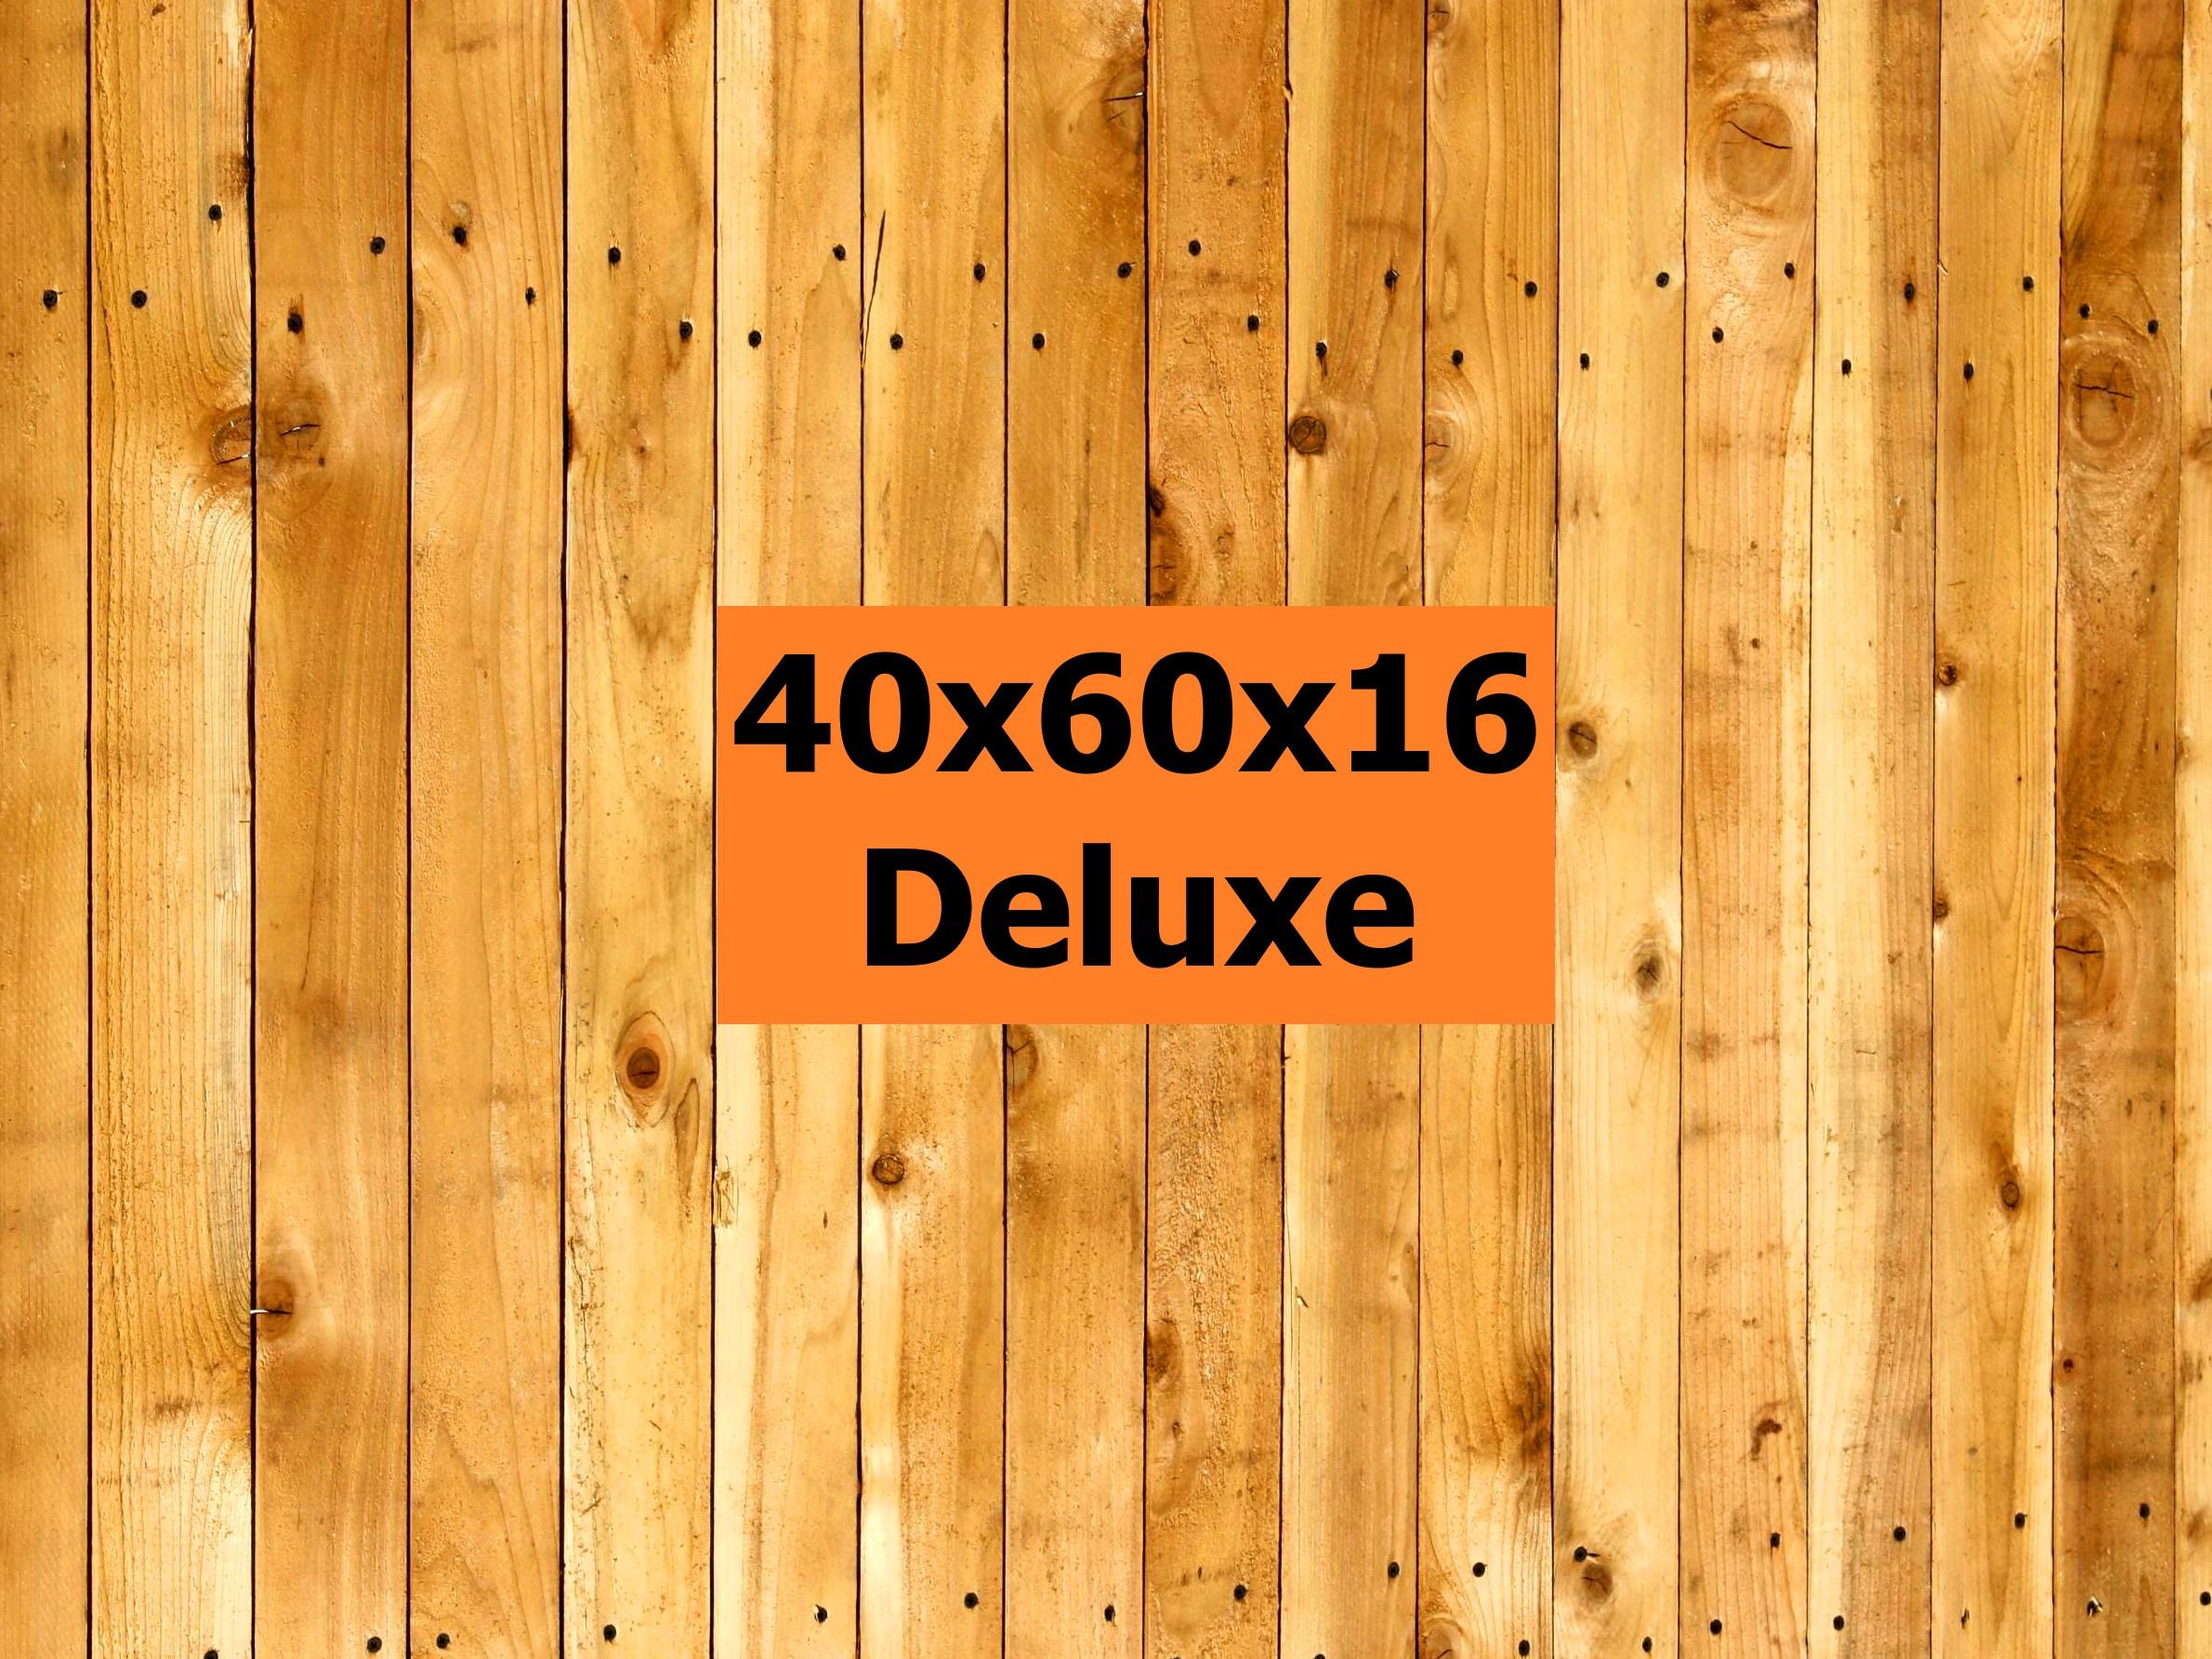 40x60x16D